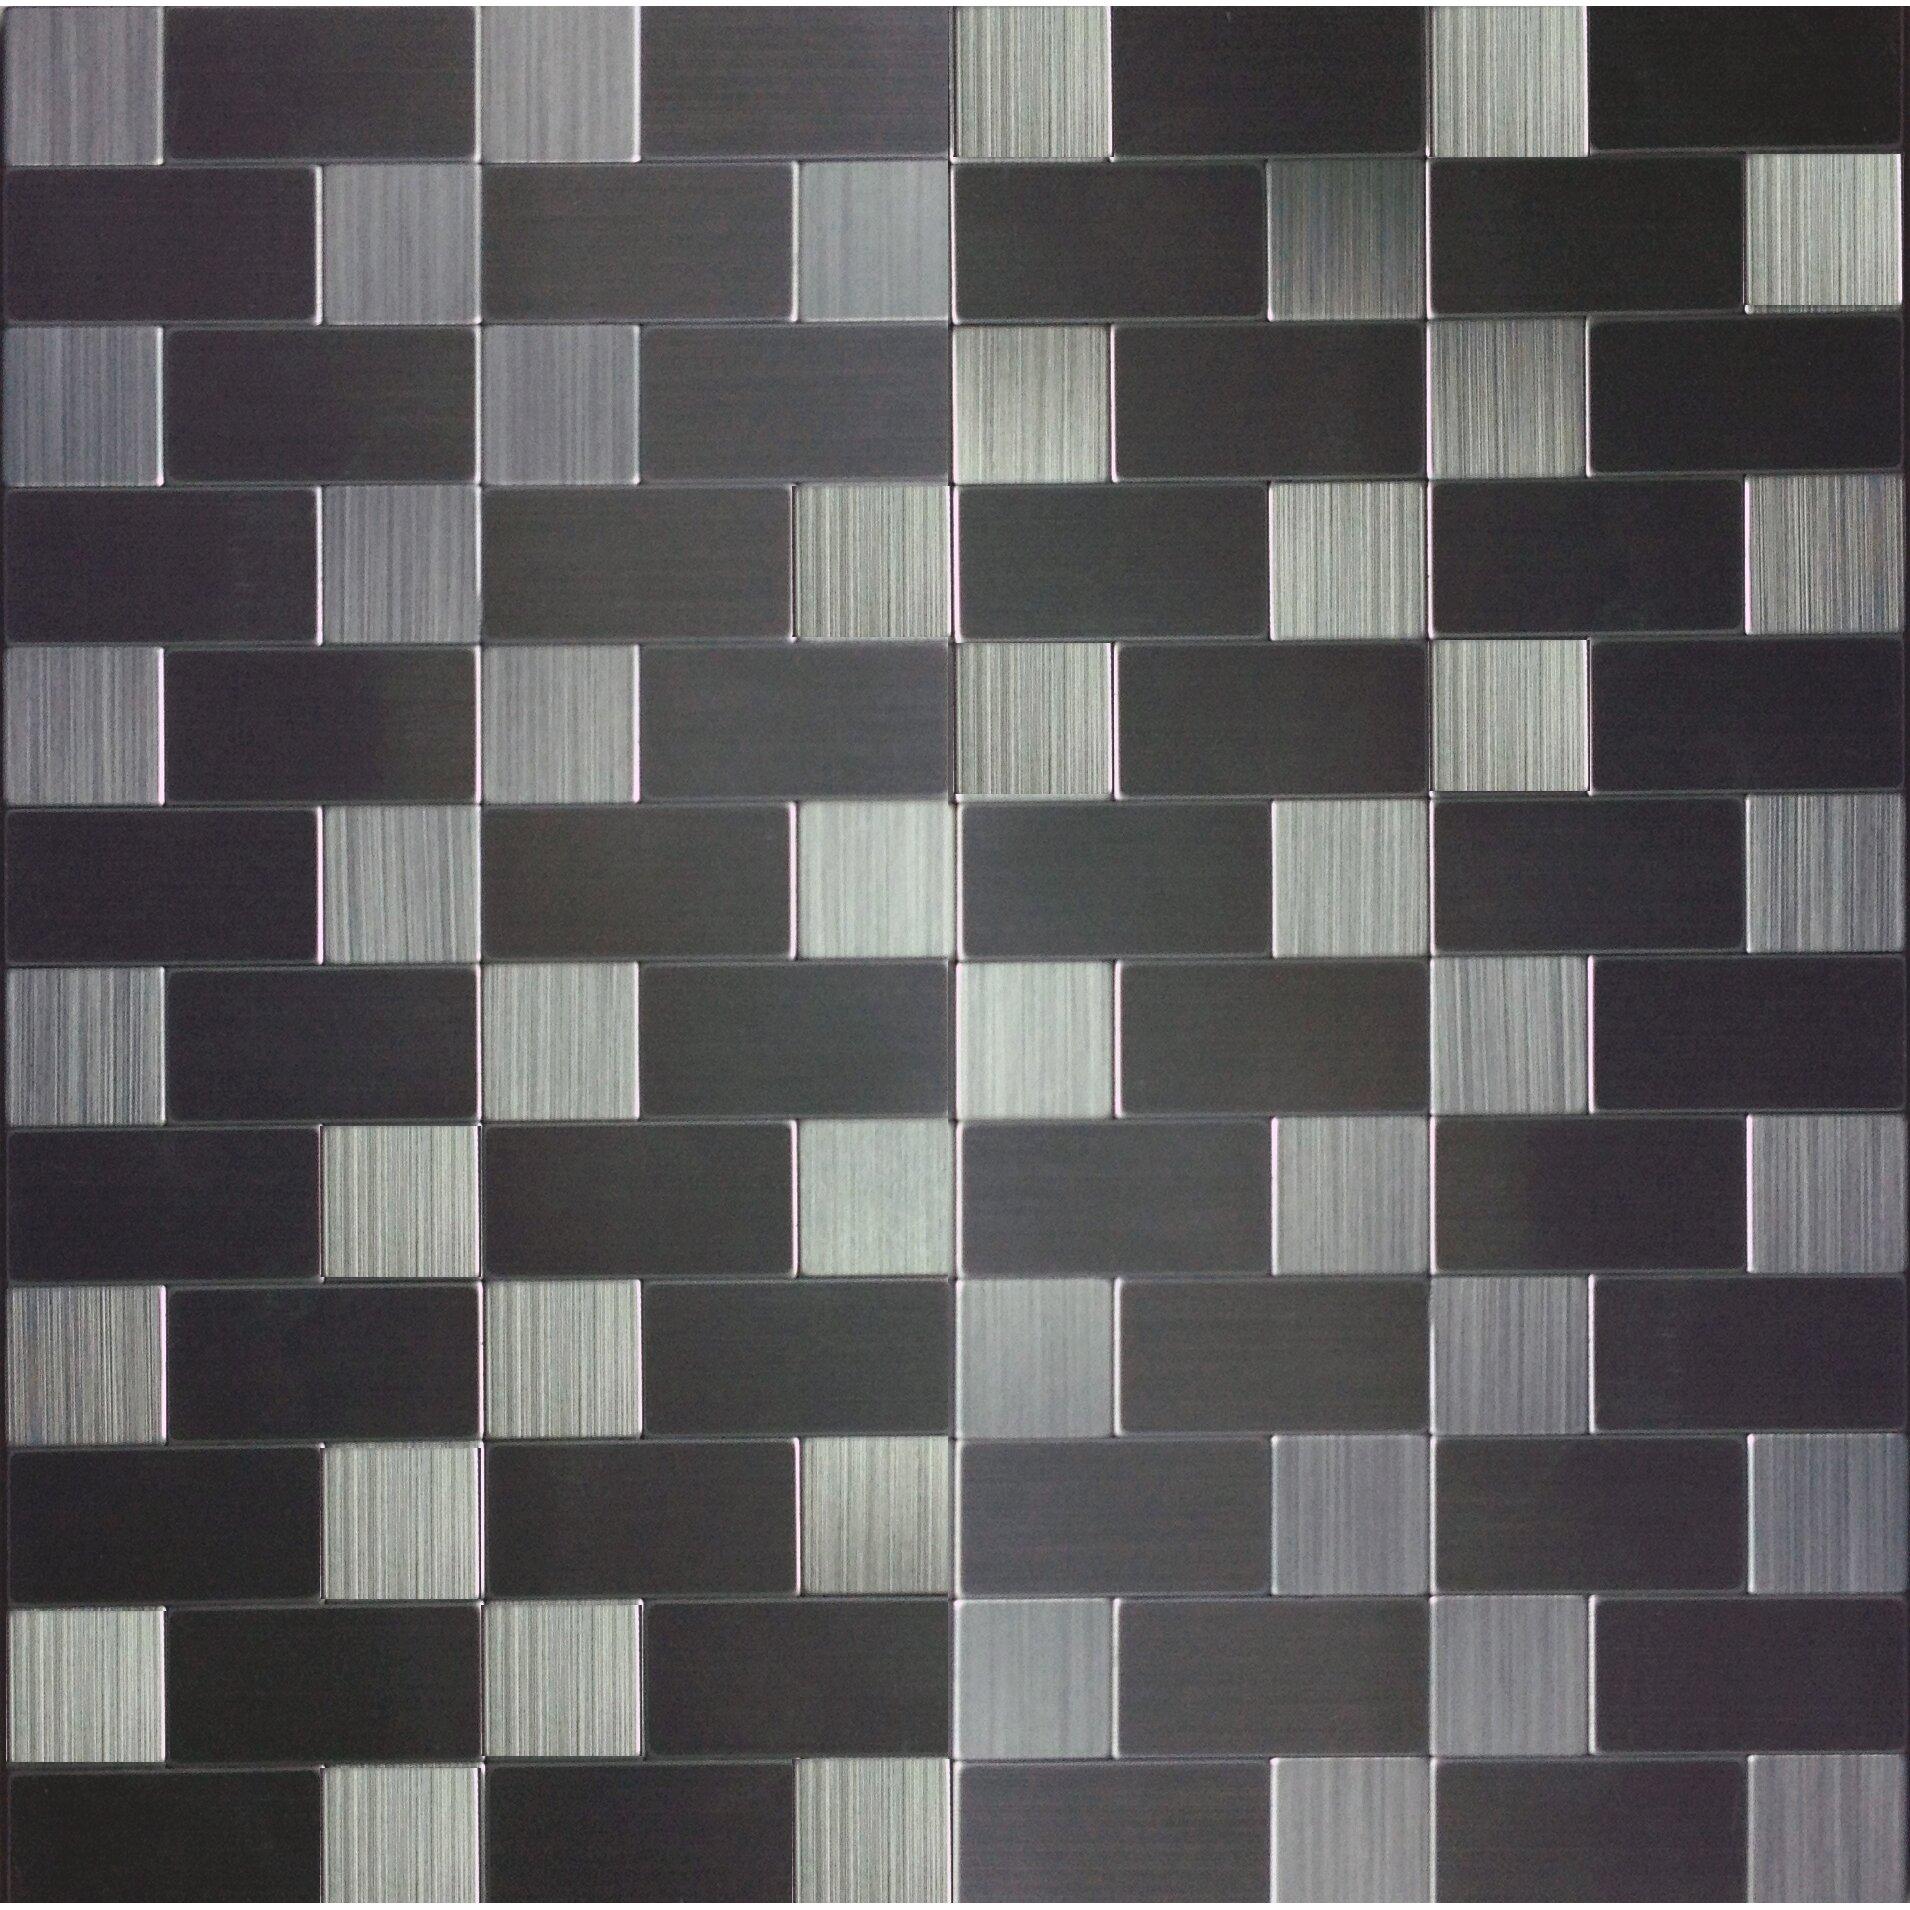 instant mosaic 12 39 39 x 12 39 39 metal peel stick mosaic tile